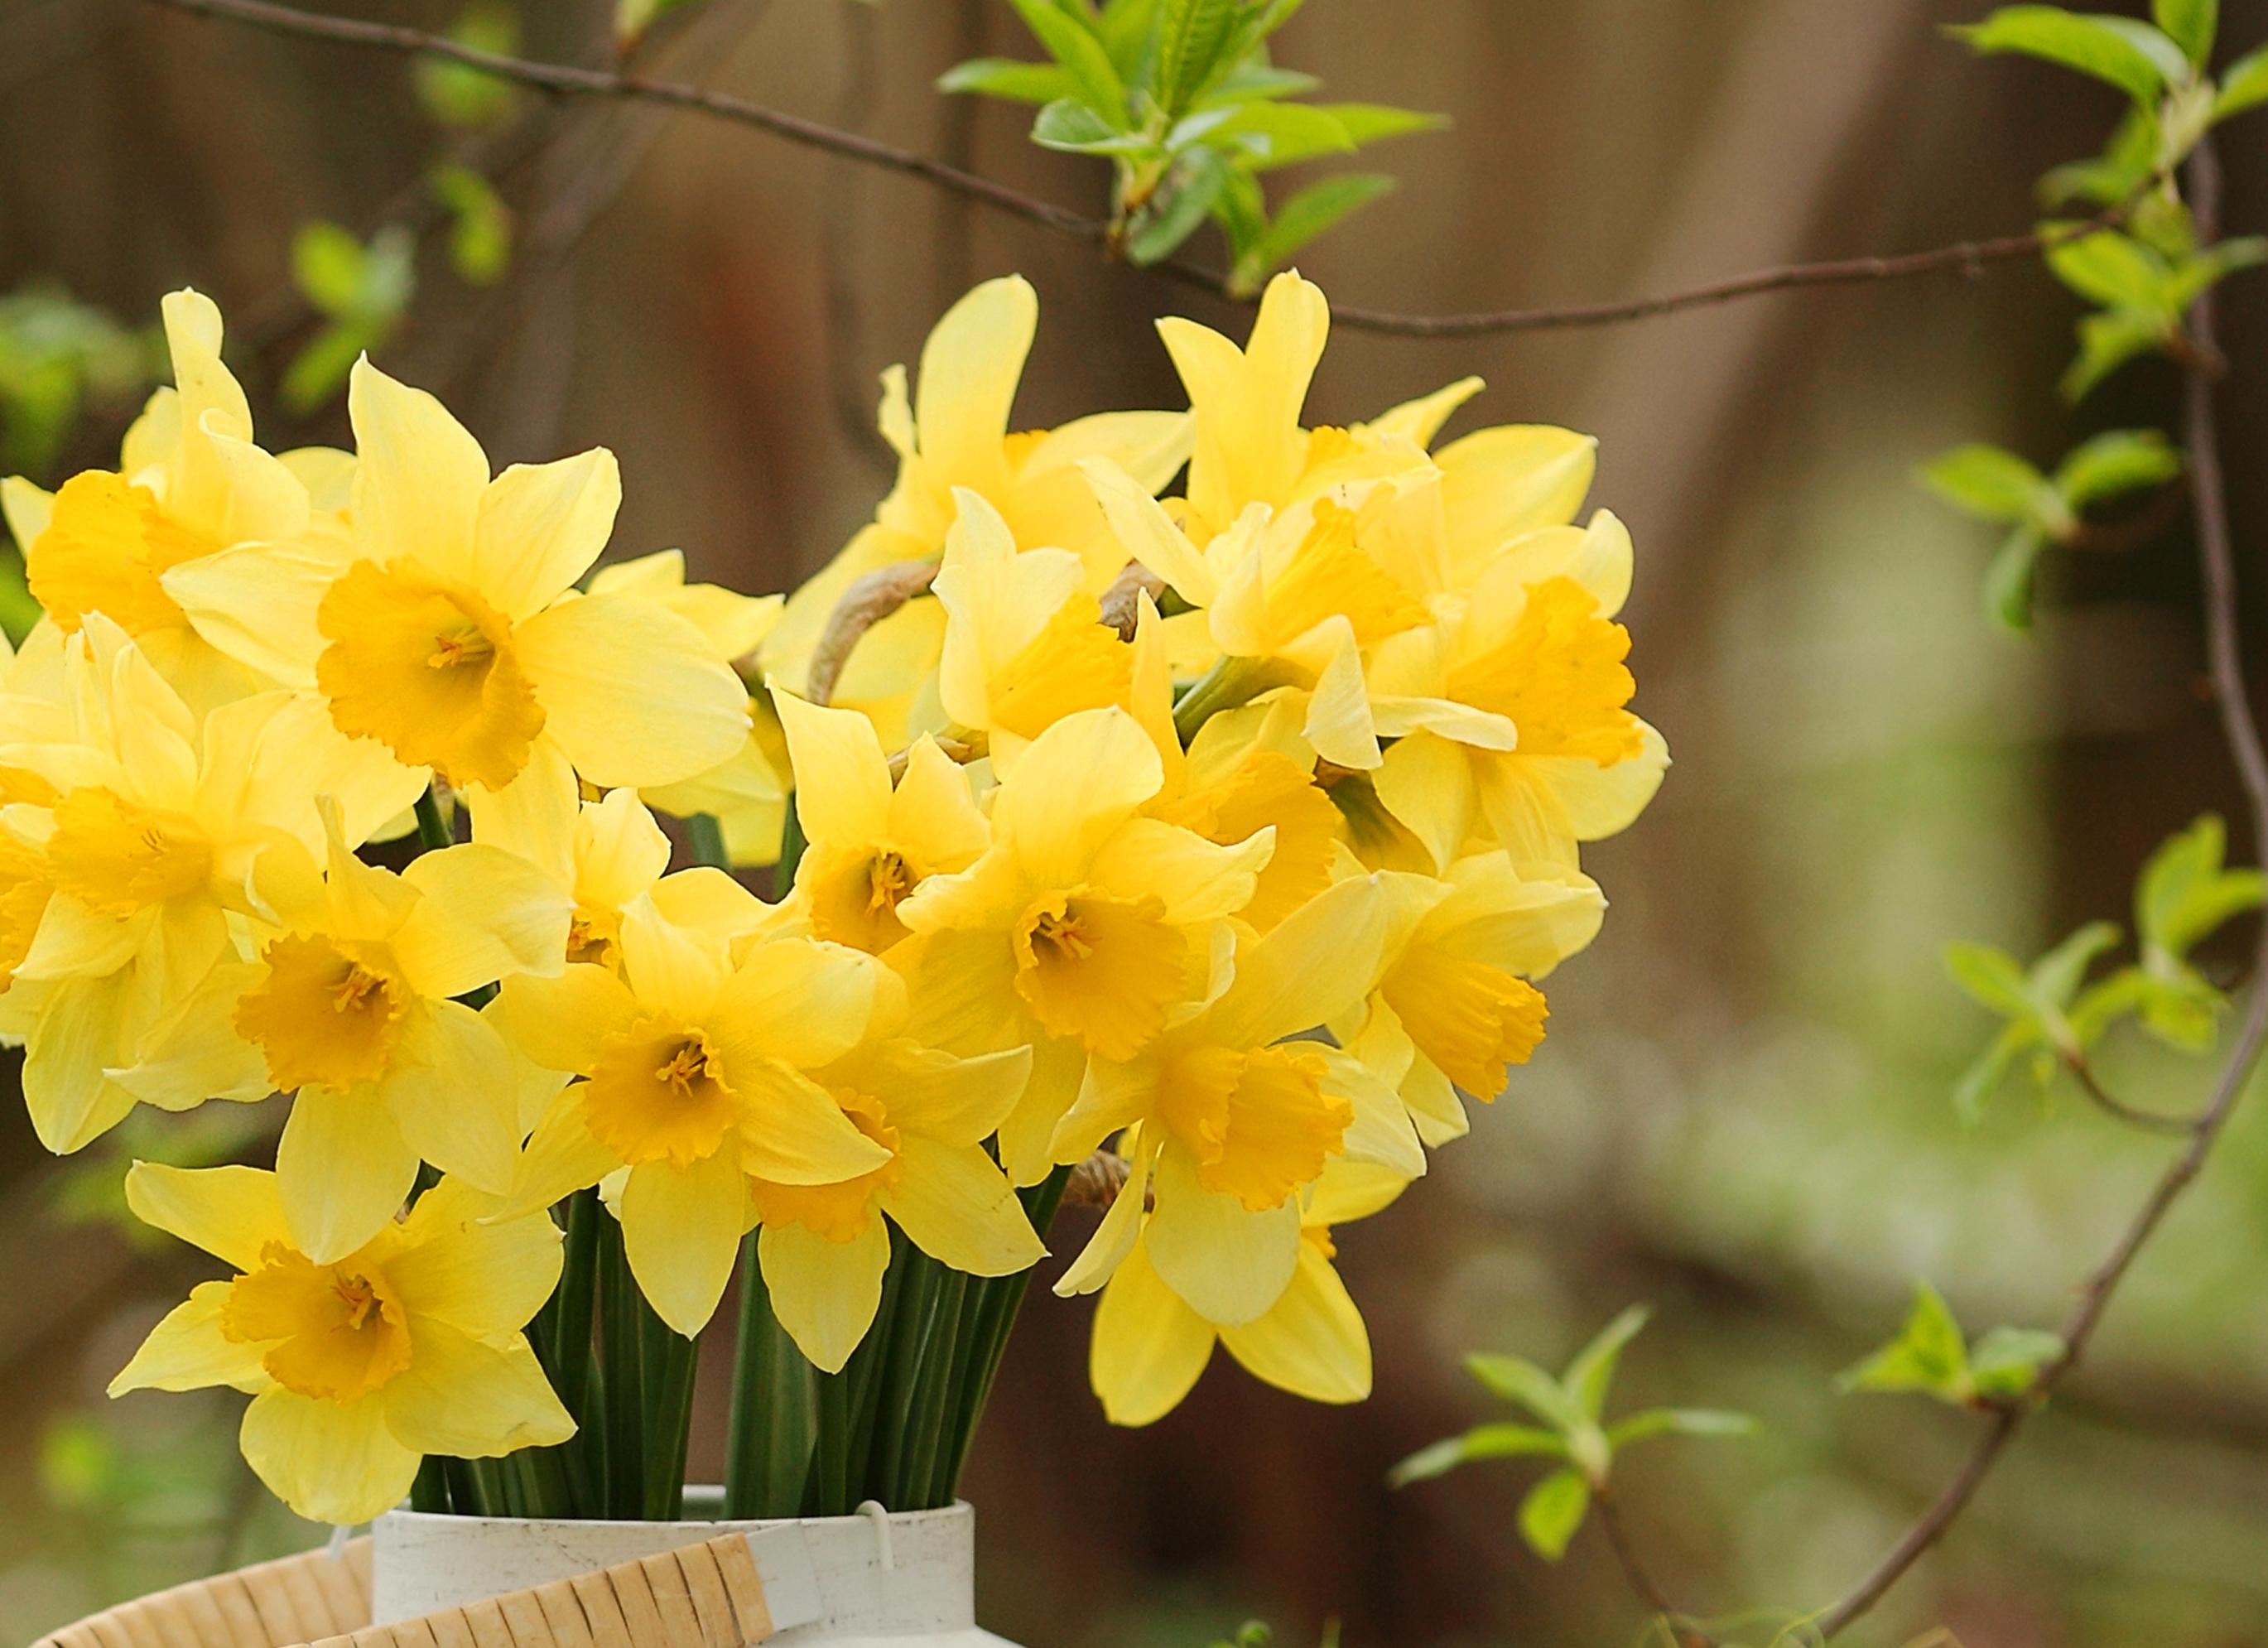 daffodils-photo-75